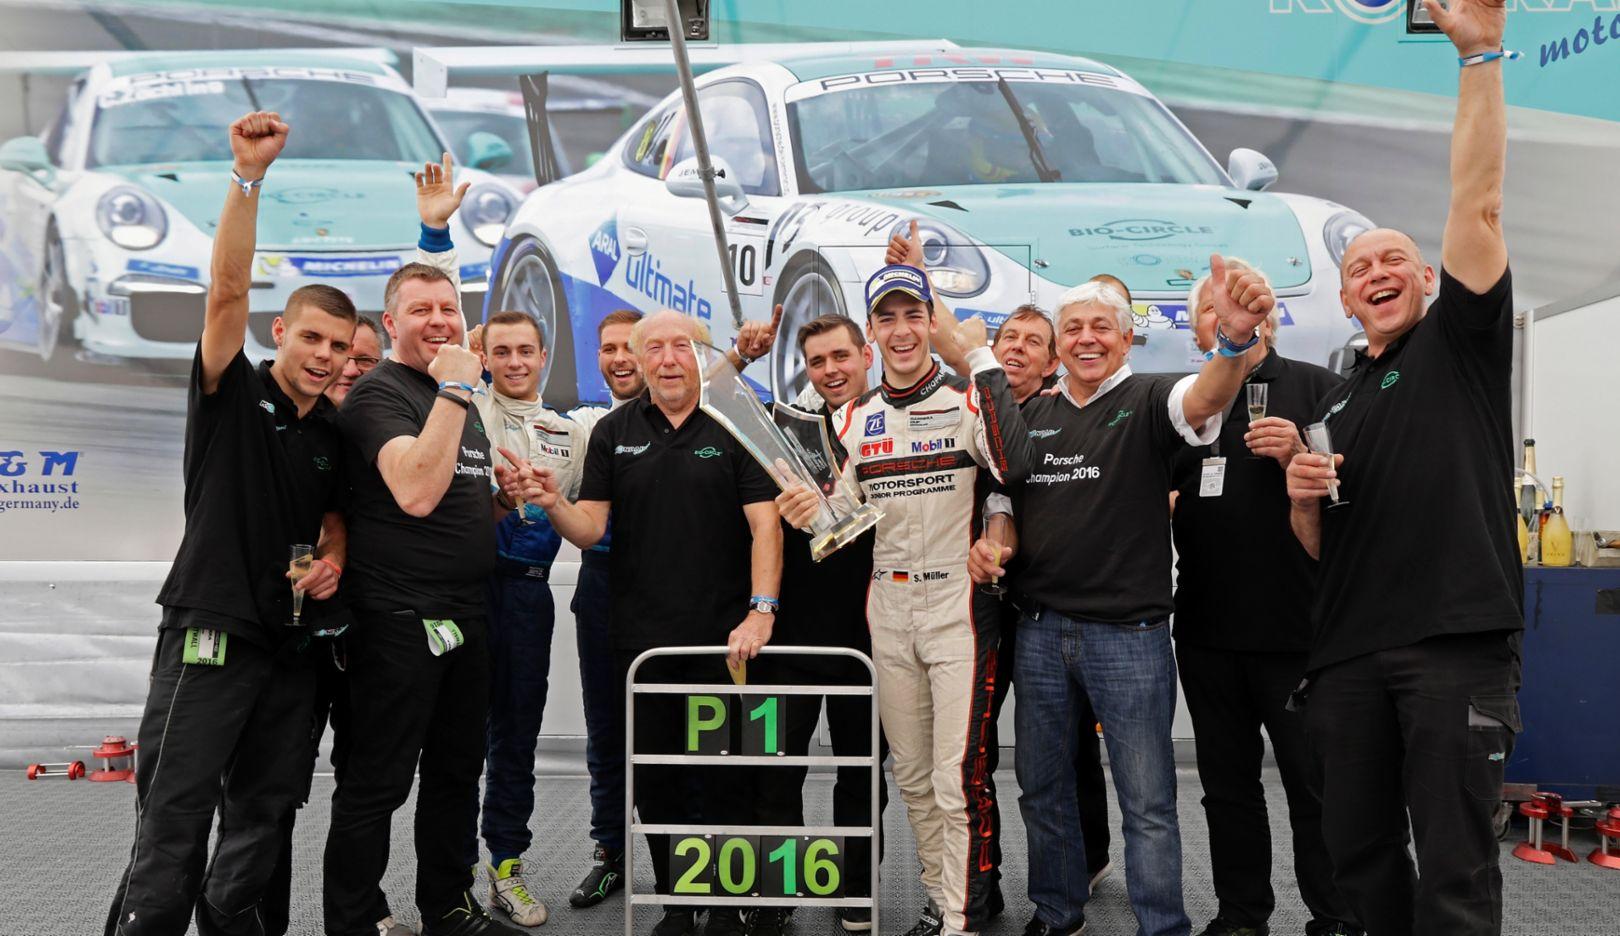 Sven Müller (D), champion, Porsche Carrera Cup Deutschland, Hockenheimring, 2016, Porsche AG